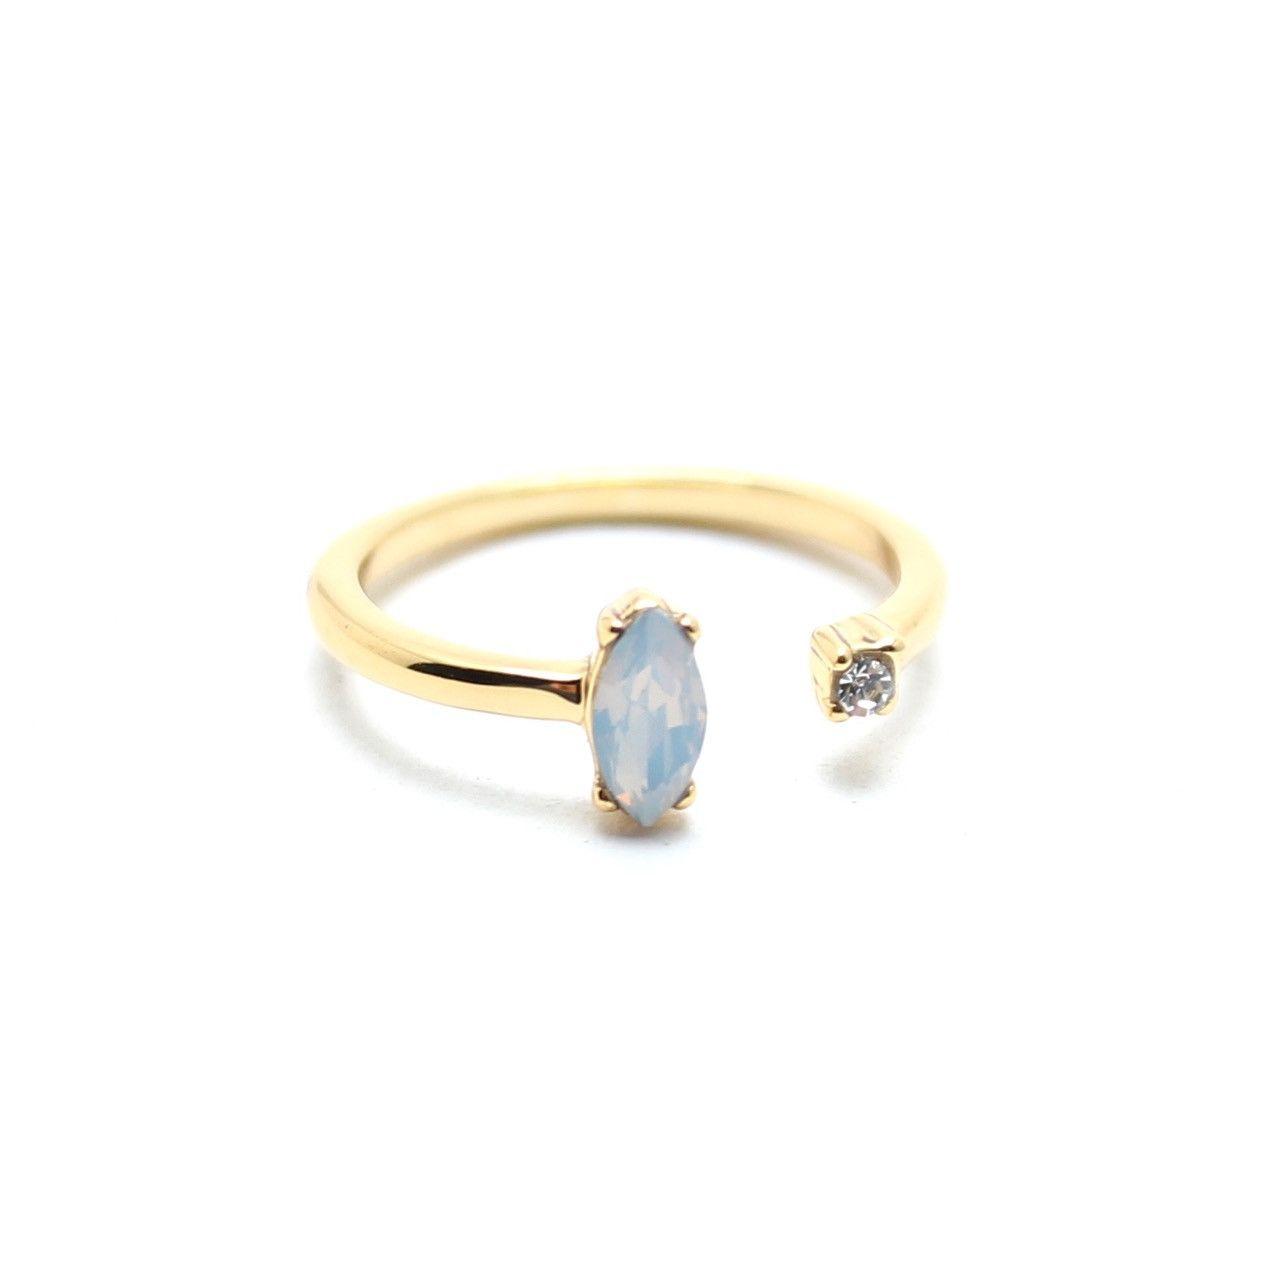 Morning Star Open Midi Ring | Morning star, Ring and Jewel